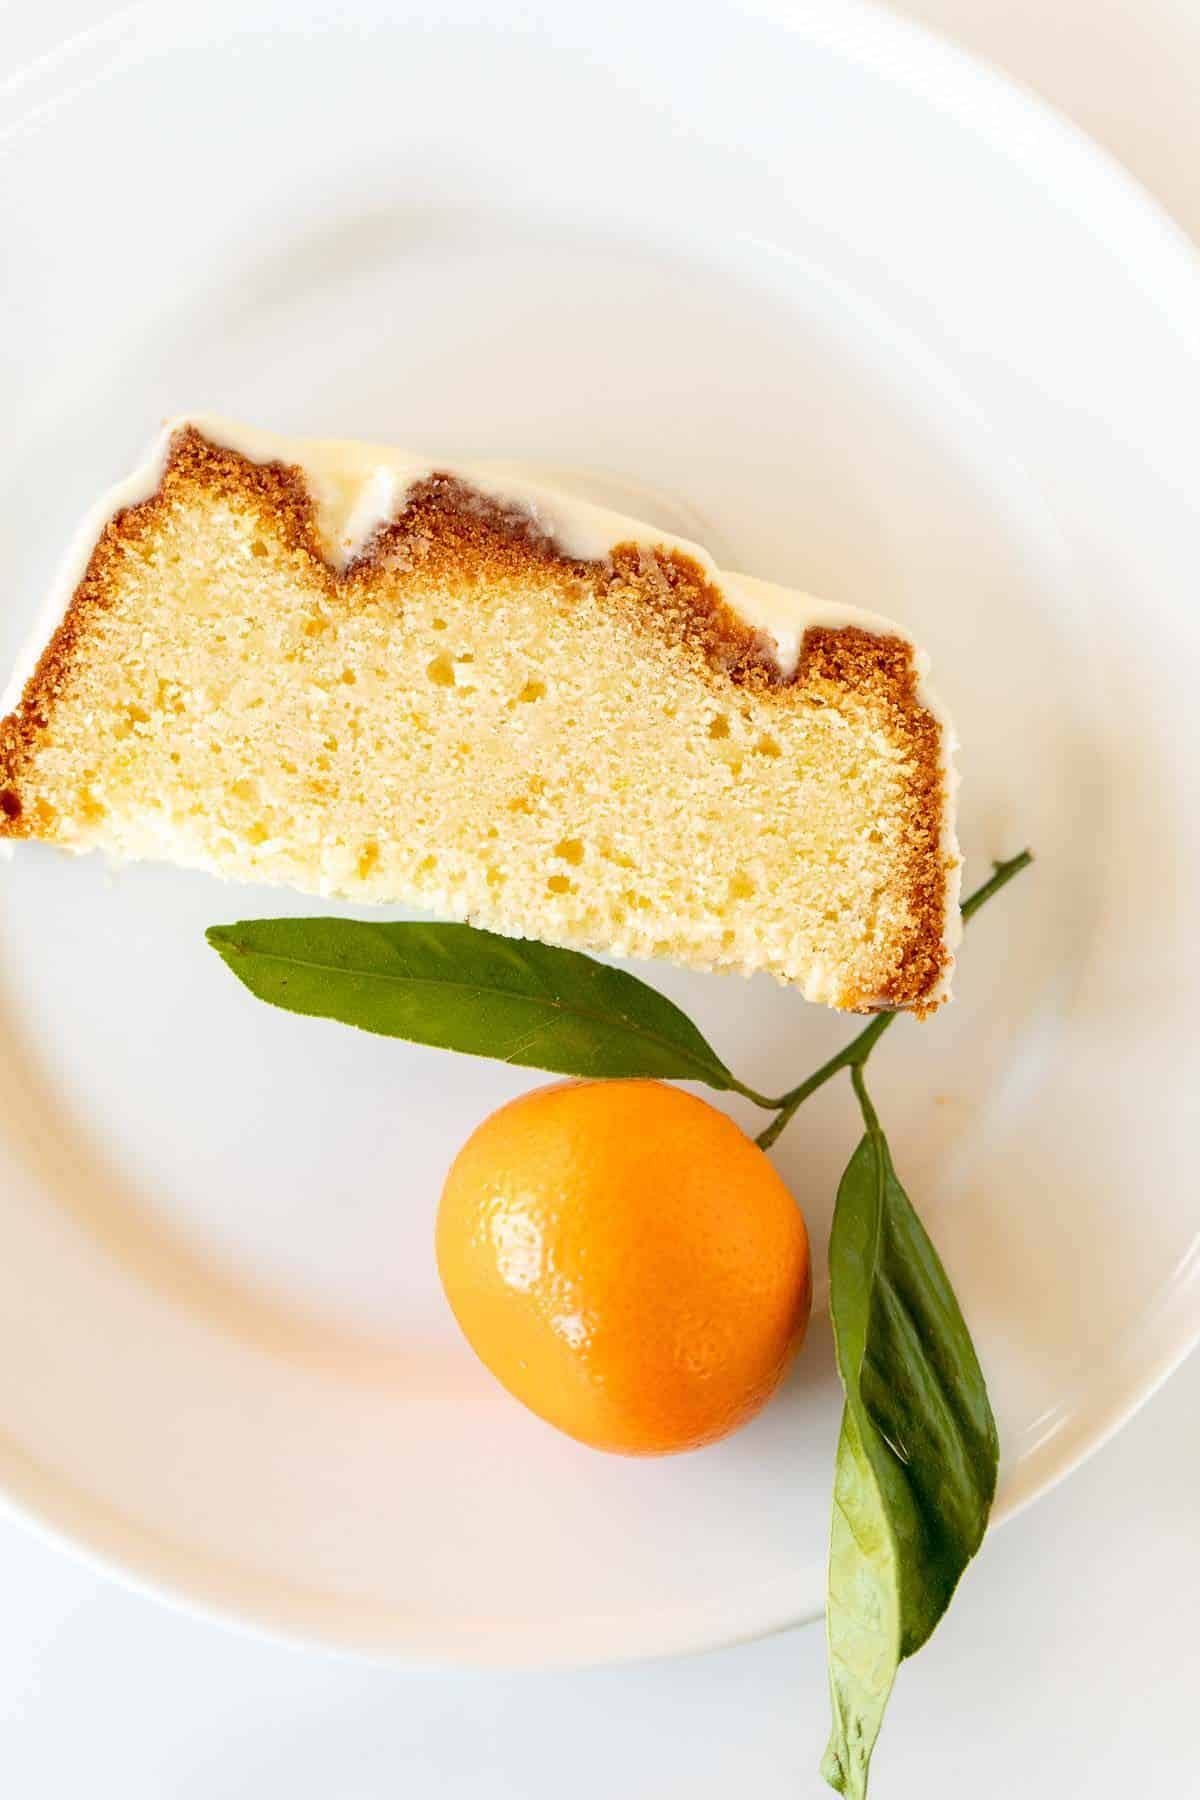 A single slice of orange pound cake on a white plate, single orange to the side.